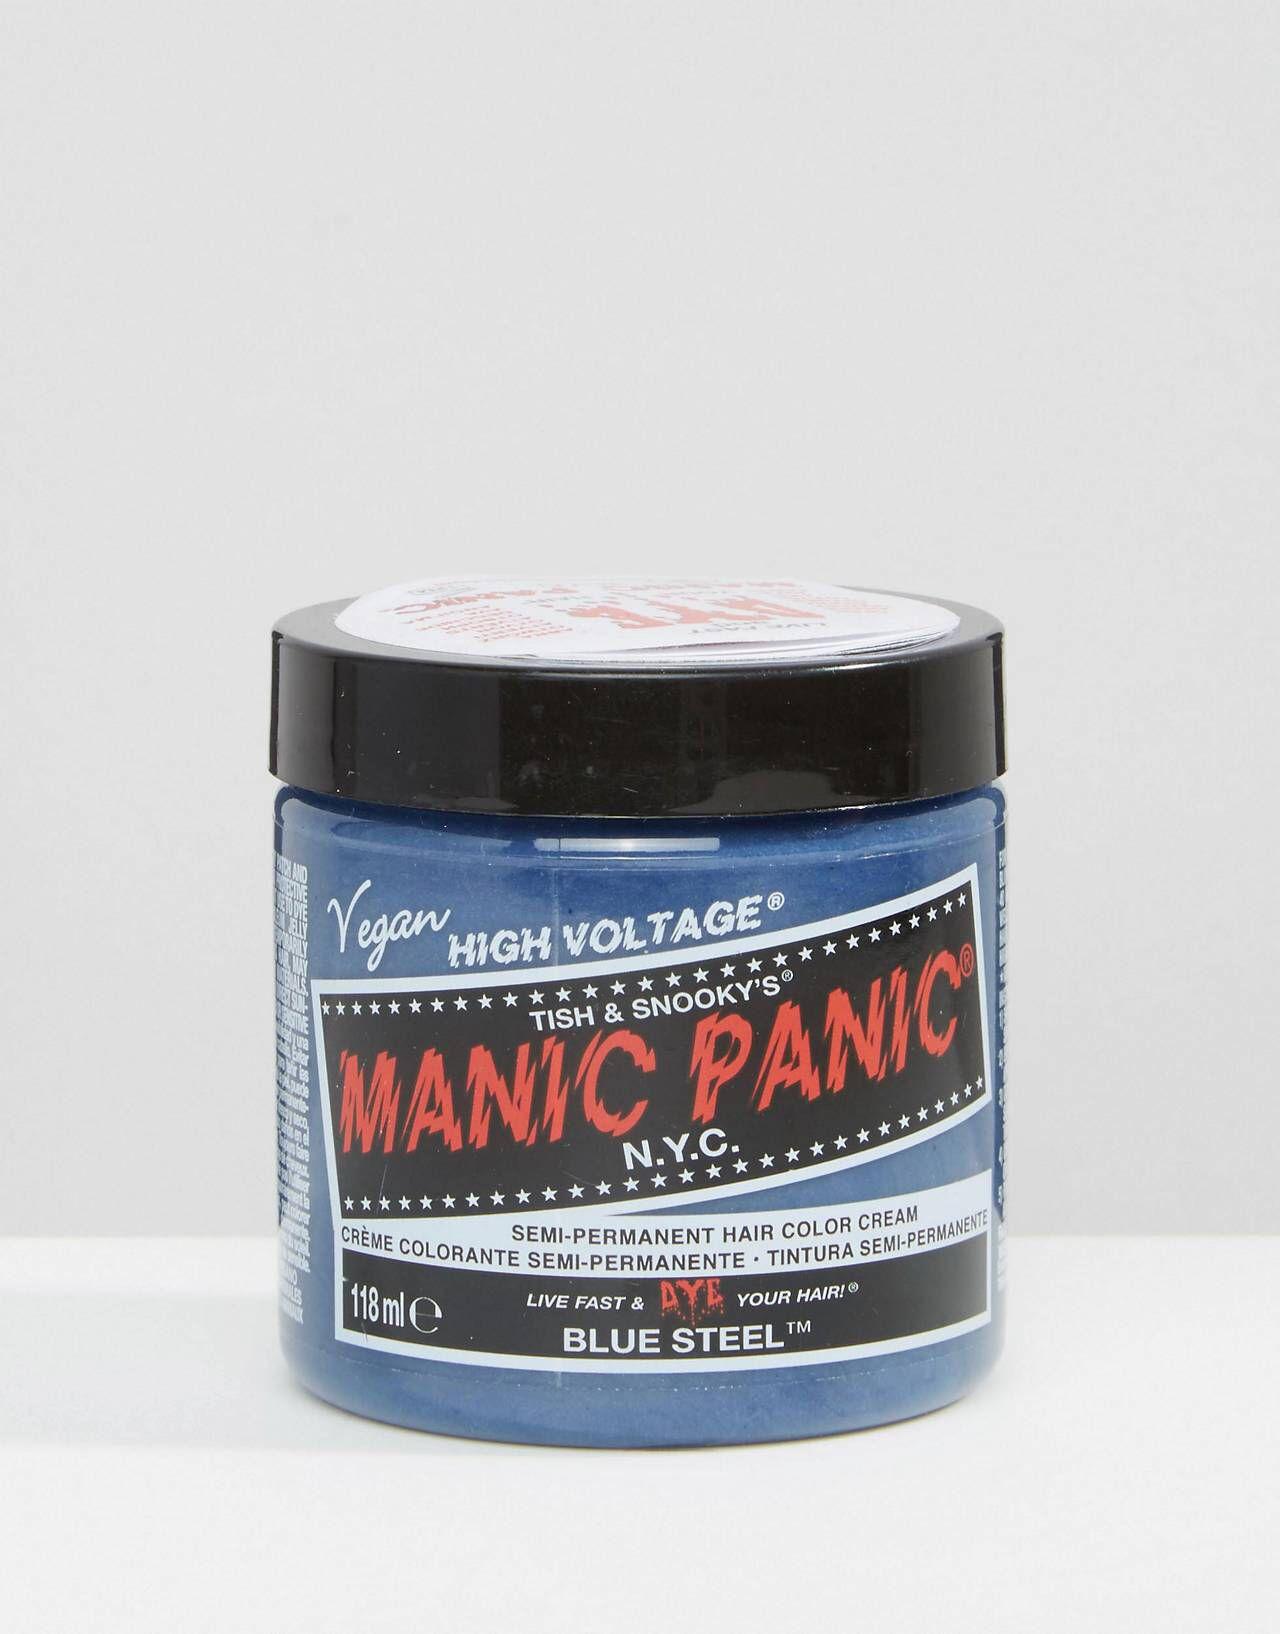 Manic panic nyc classic semi permanent hair color cream blue steel